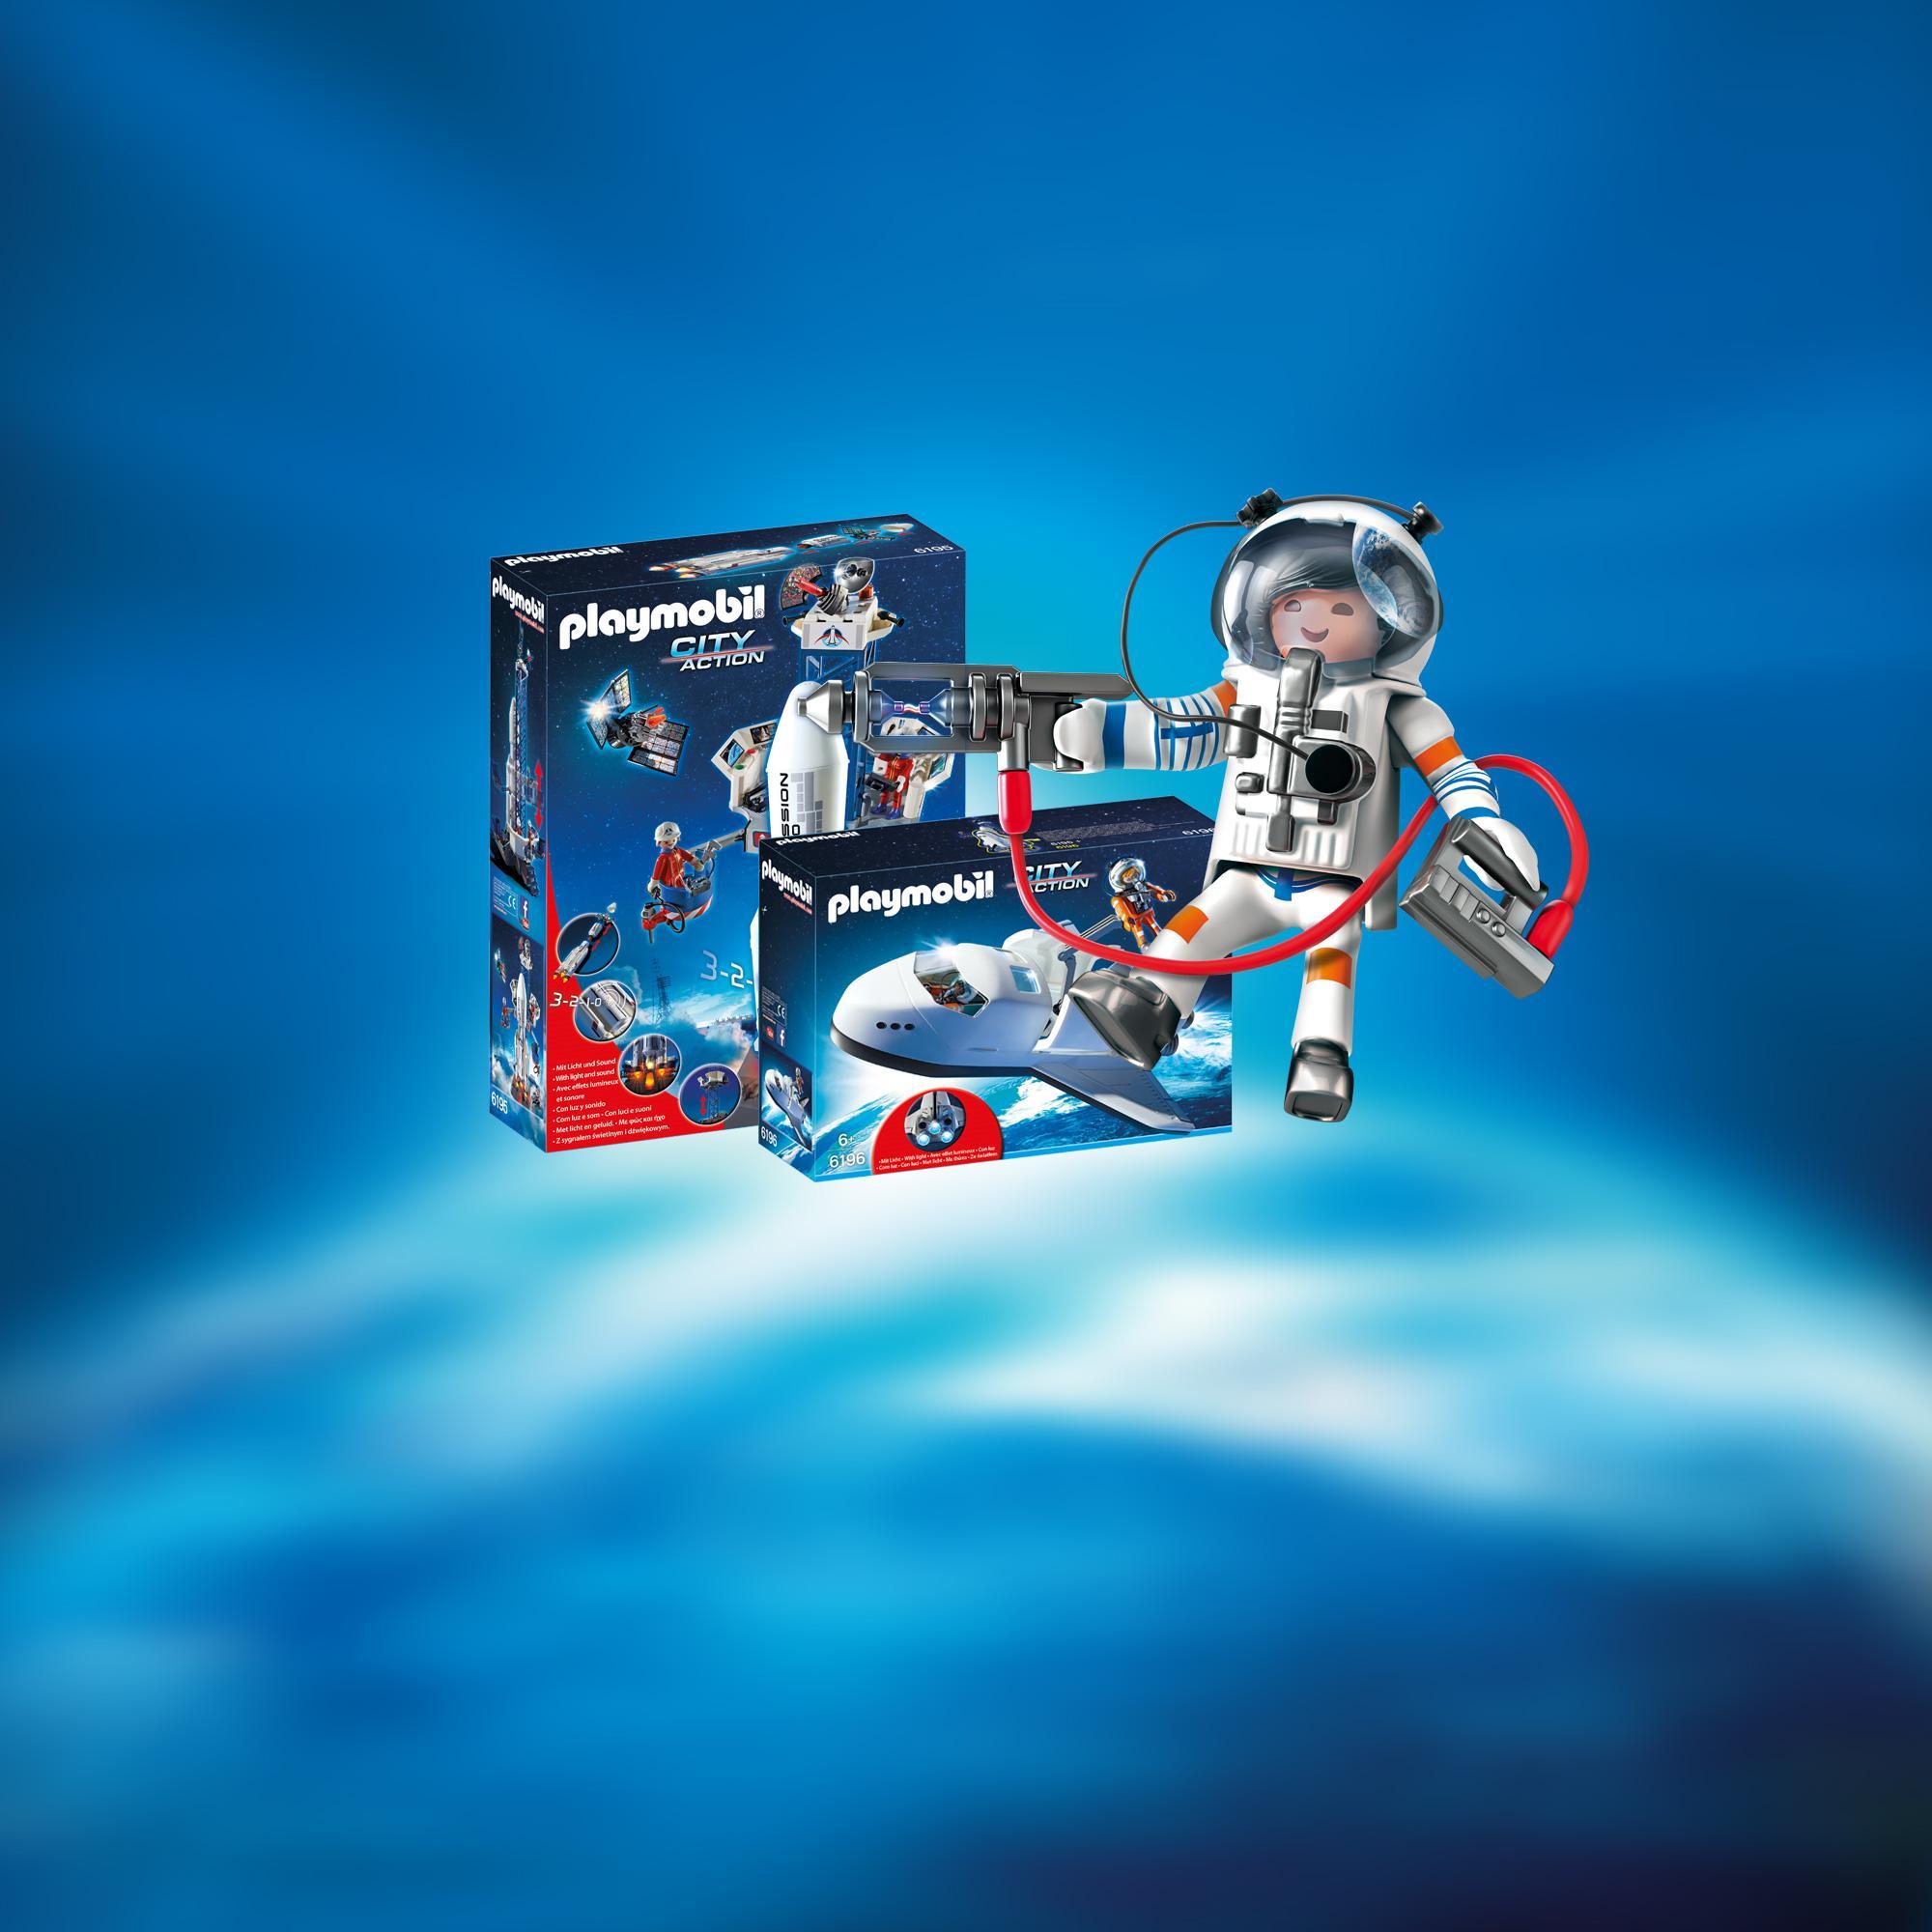 Playmobil 174 Usa